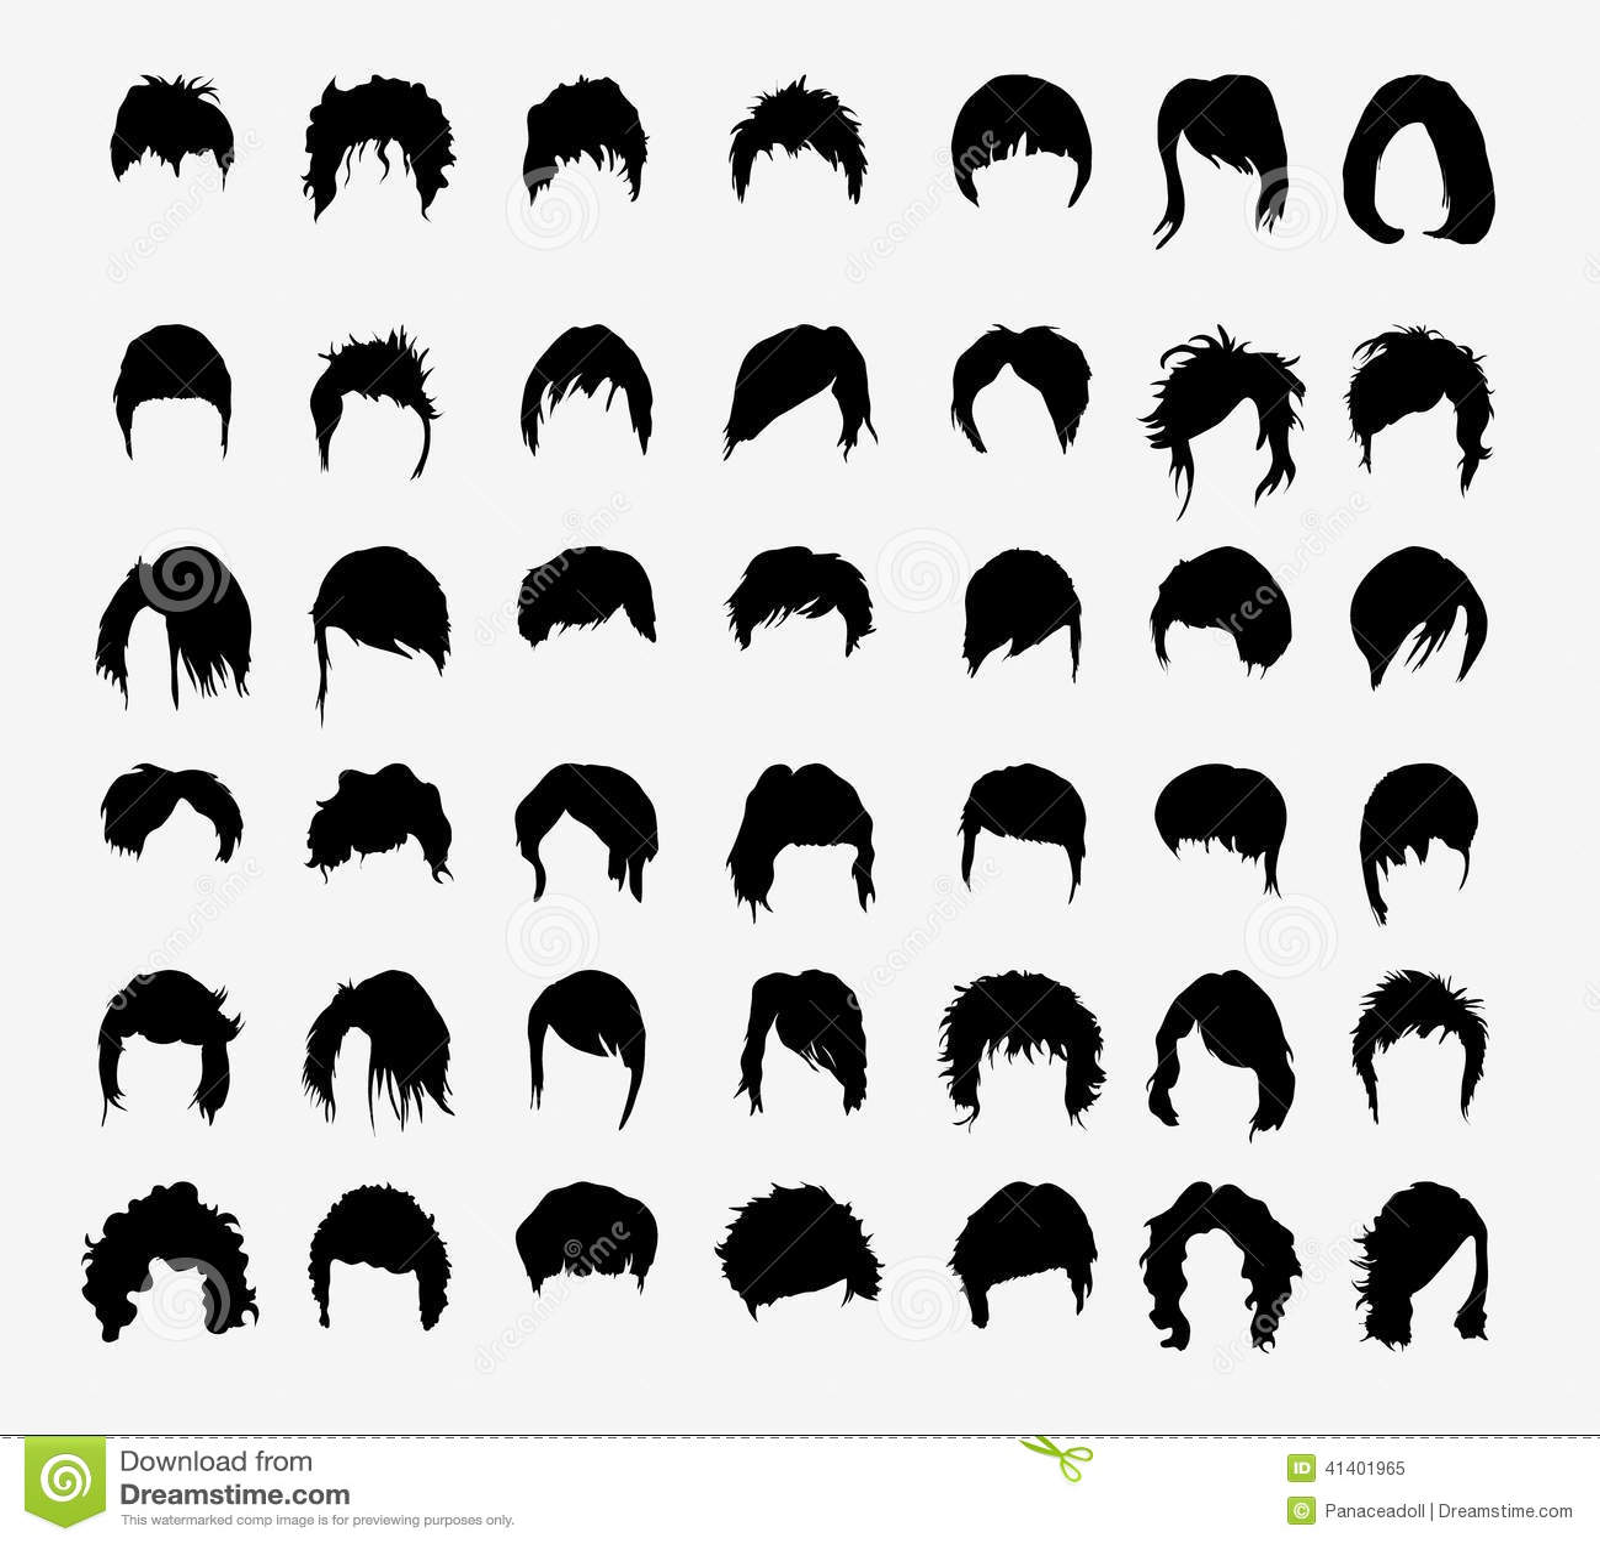 Vector Set Of Women's Hairstyles Stock Vector - Image ...